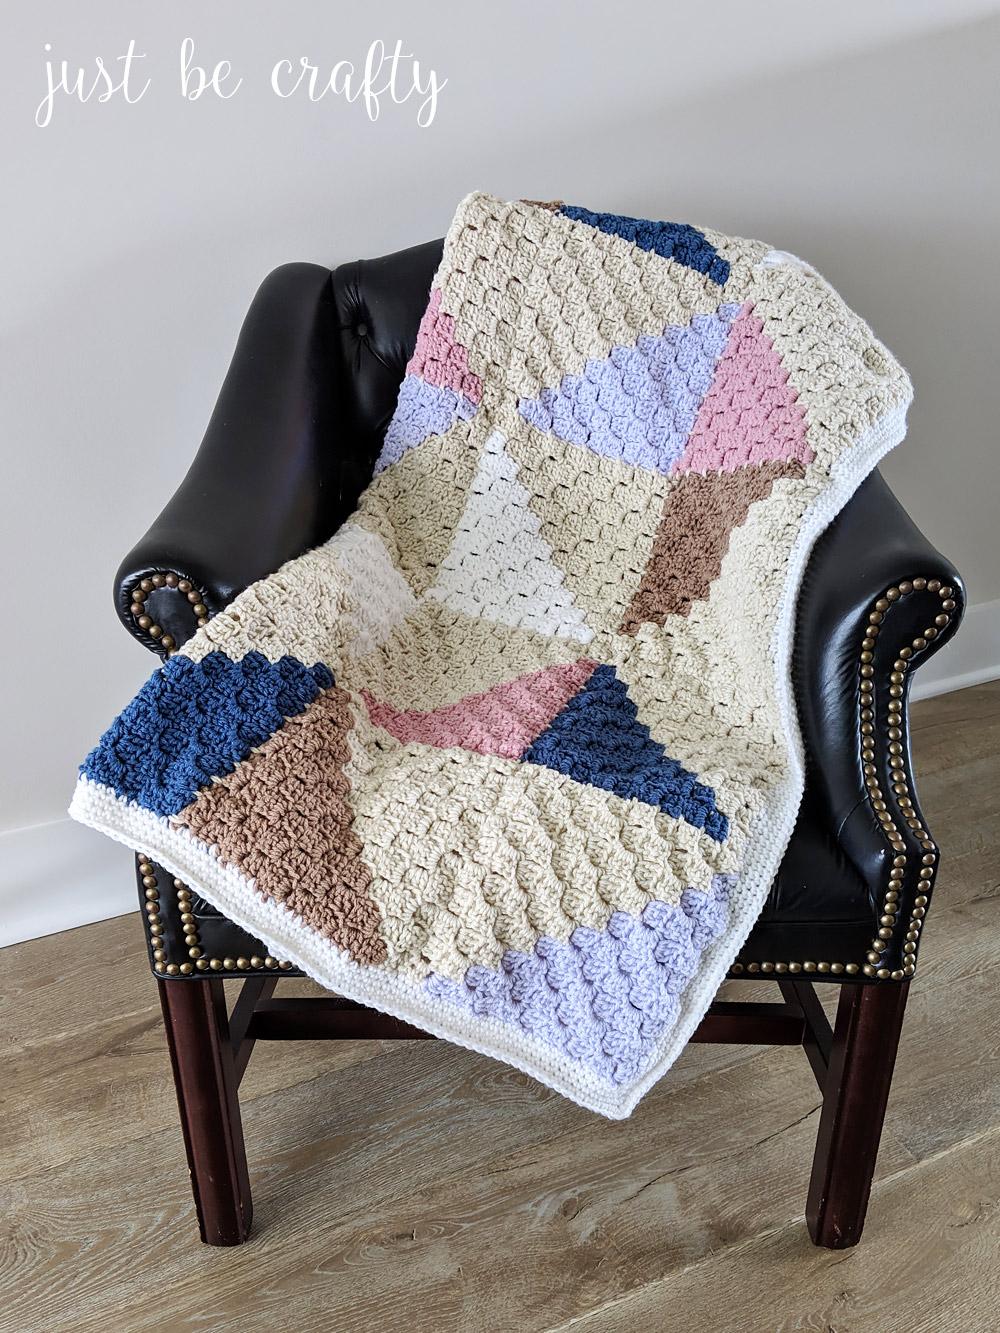 Crochet Afghan Quilt: C2C Square Tutorial